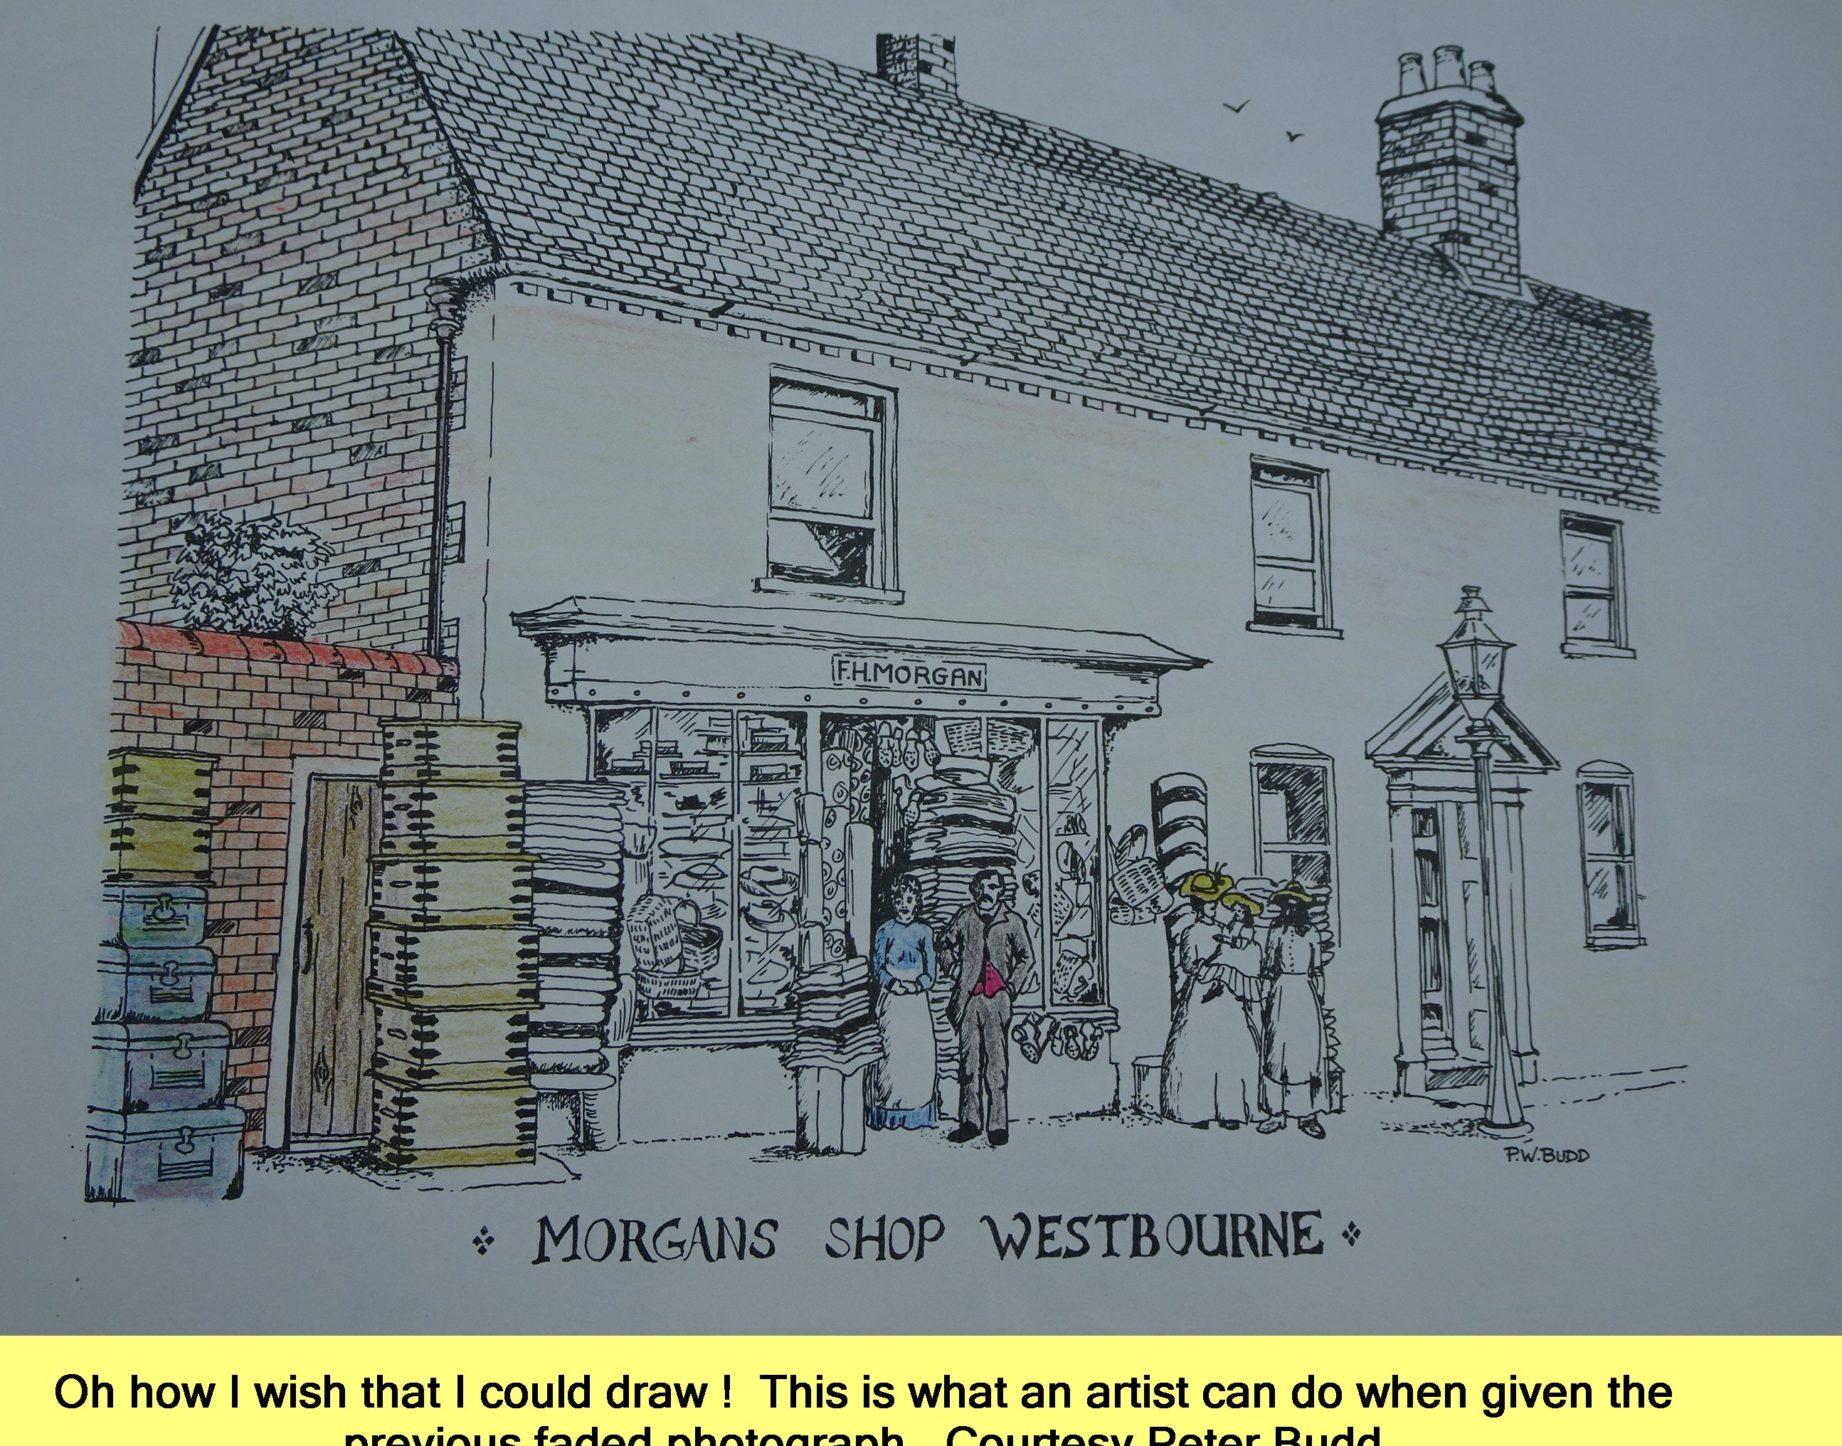 Morgans shop drawing